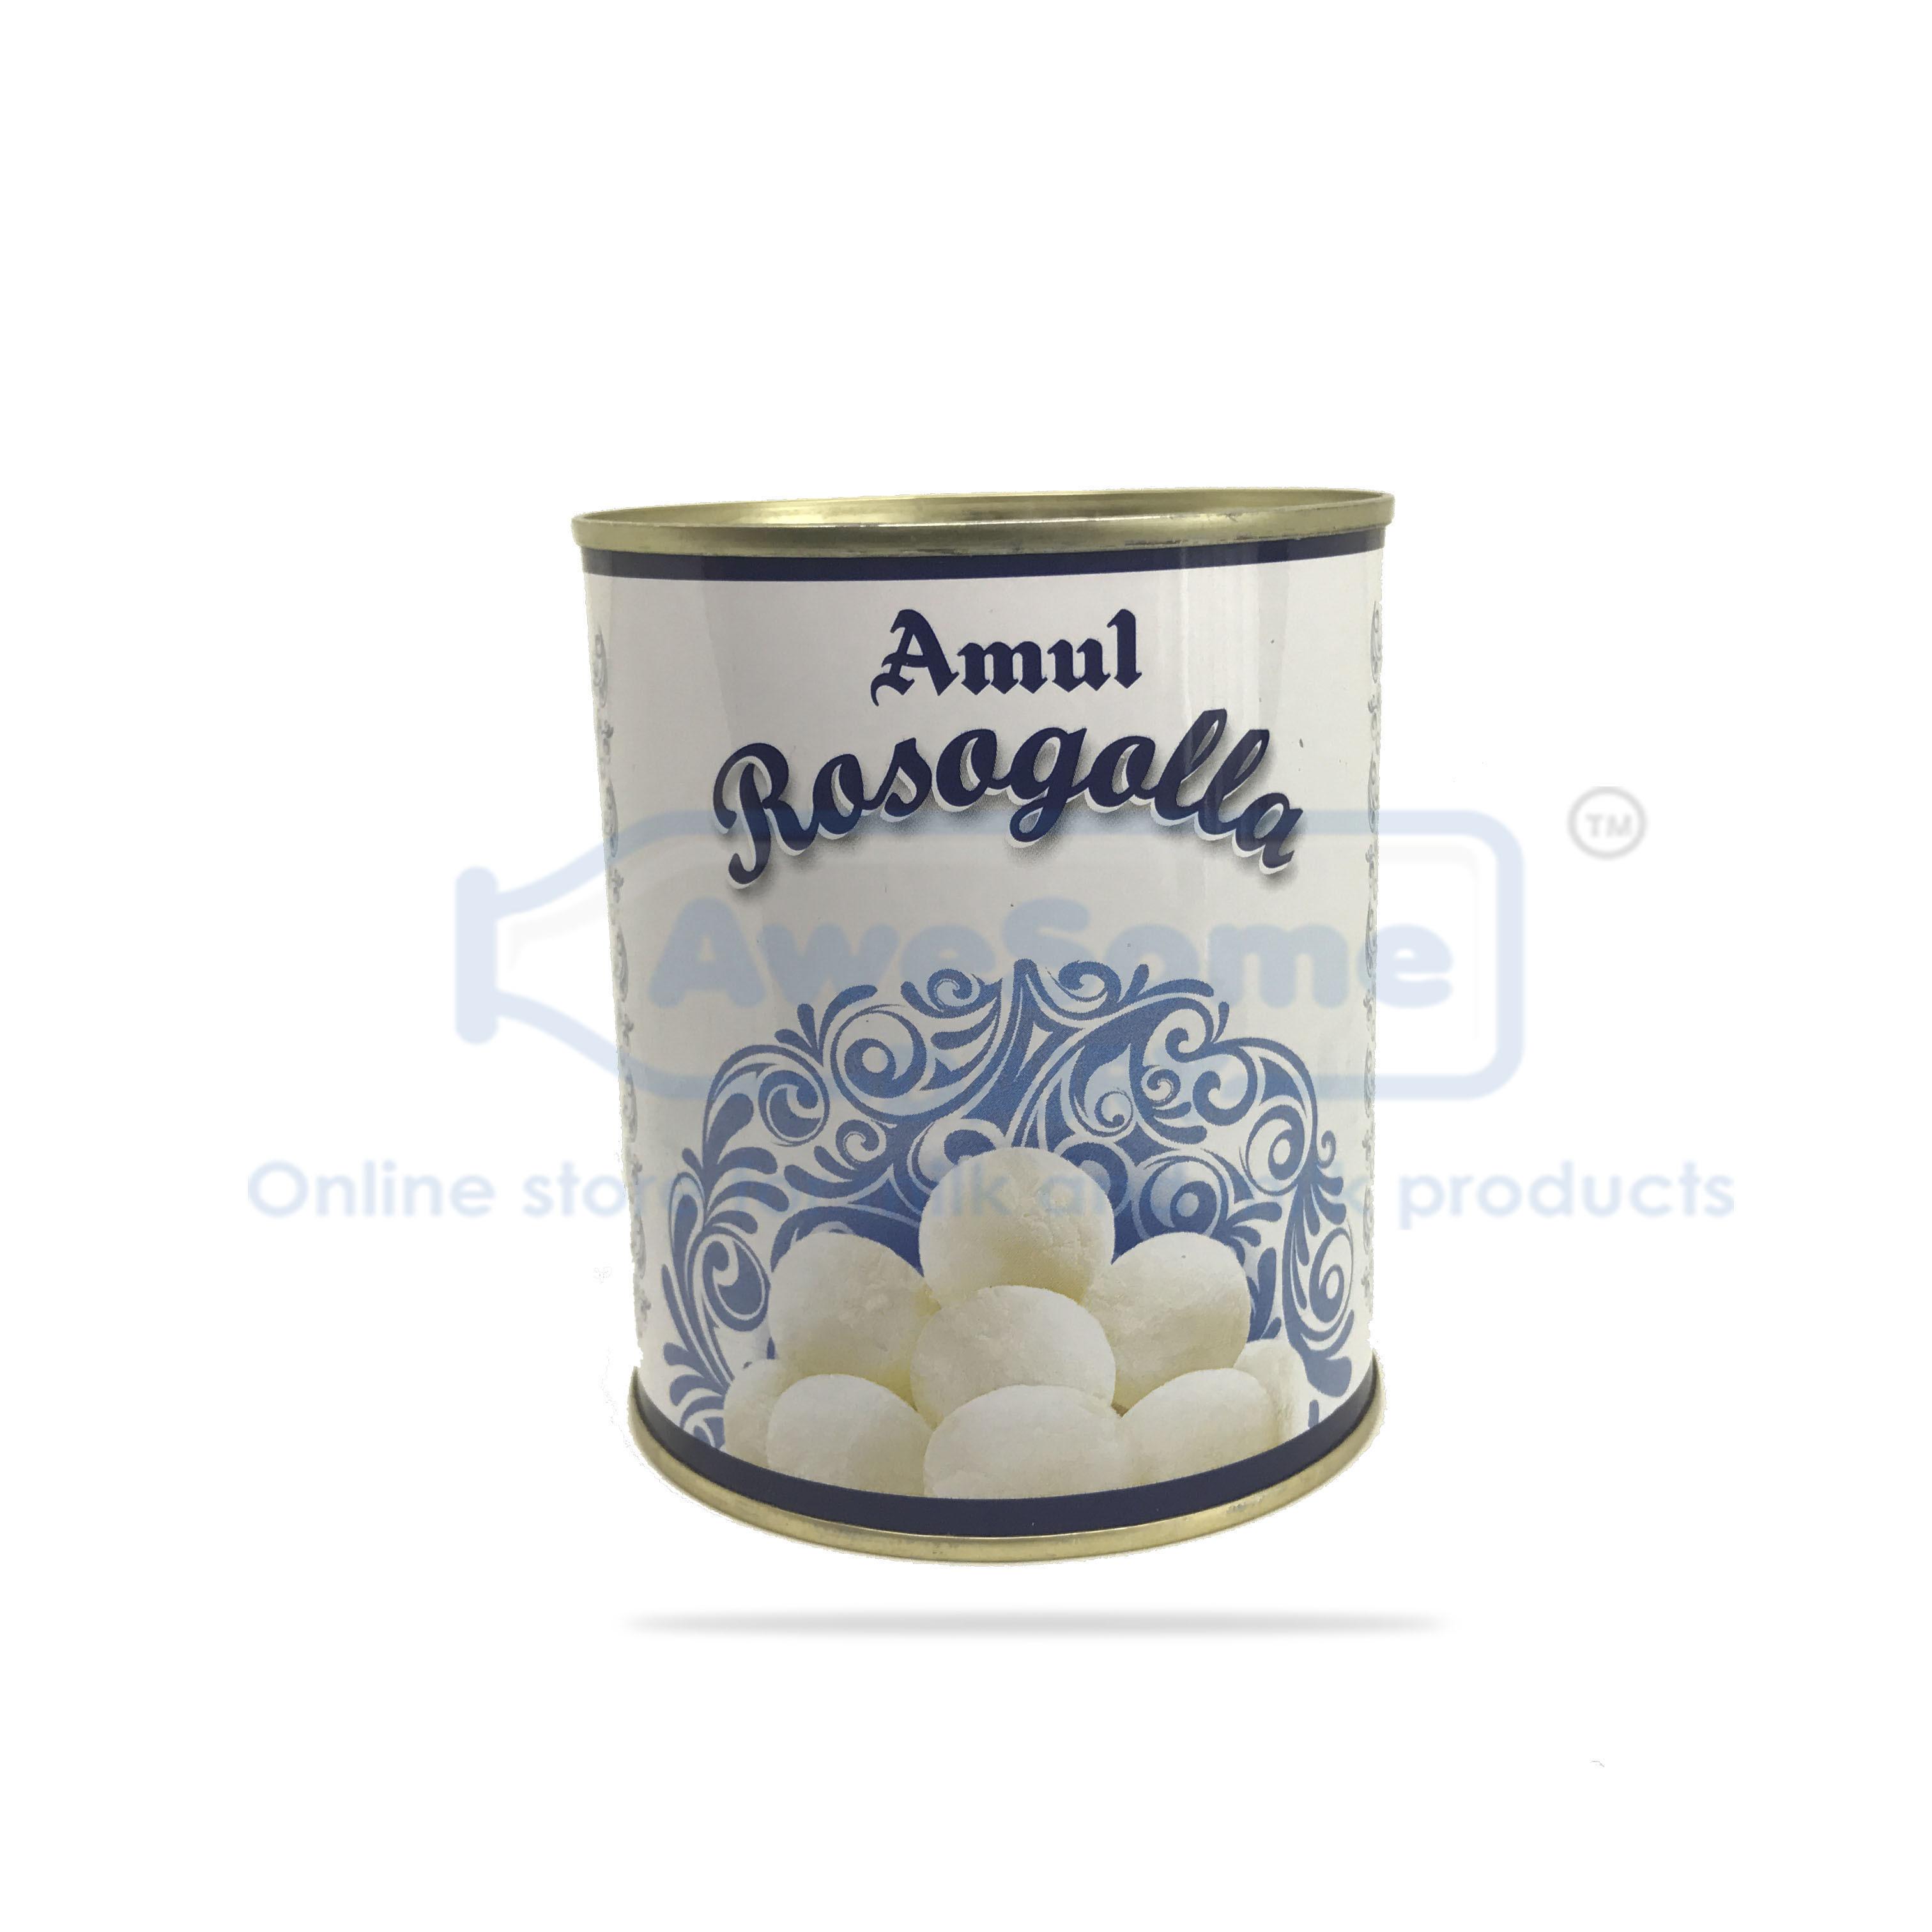 amul sweets,haldiram rasgulla 1kg price, rasgulla online, amul sweets